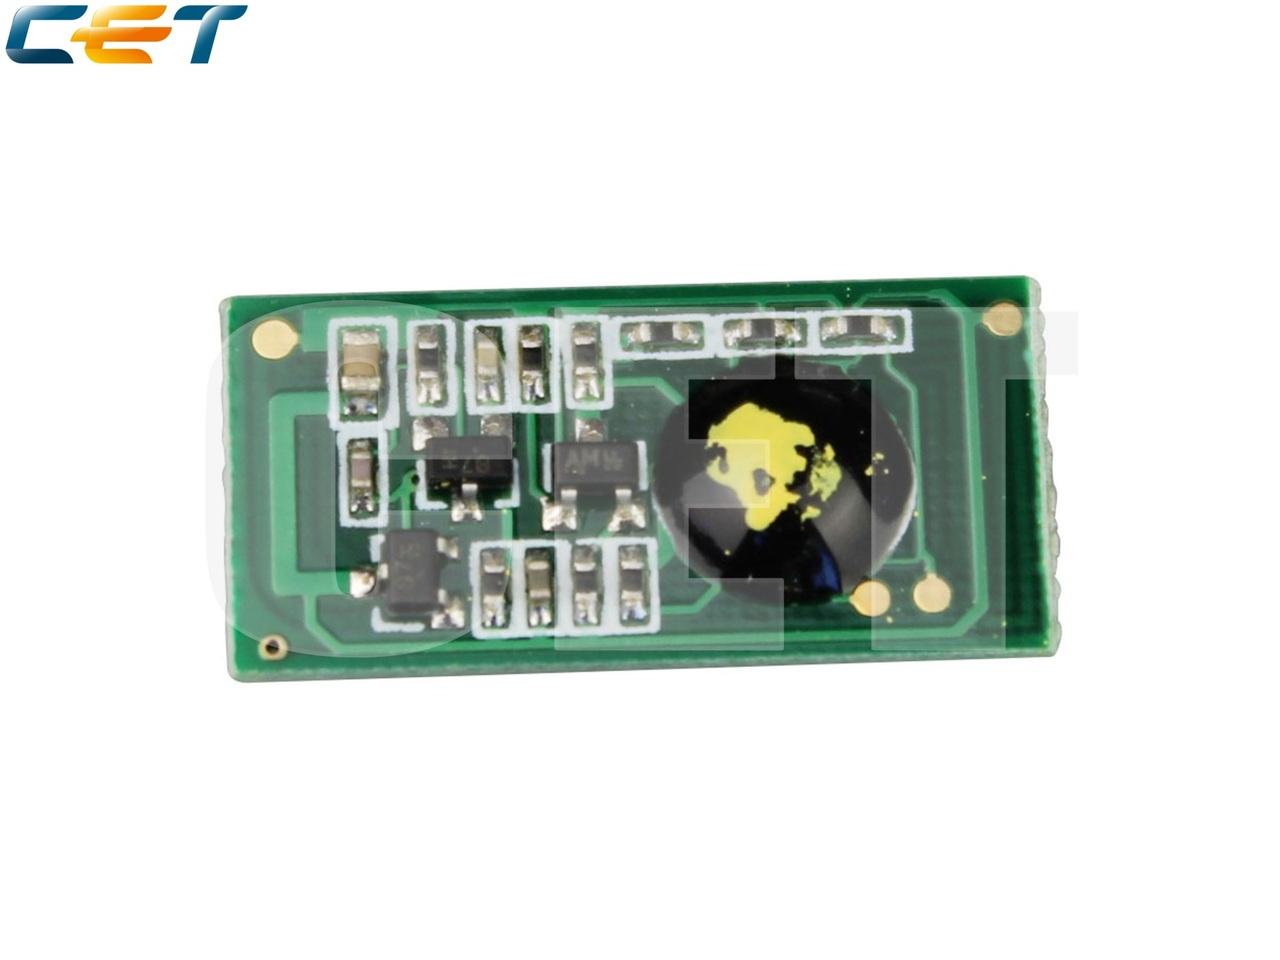 Чип картриджа для RICOH Aficio MPC4000/MPC5000 (CET)Yellow, (WW), 17000 стр., CET8294